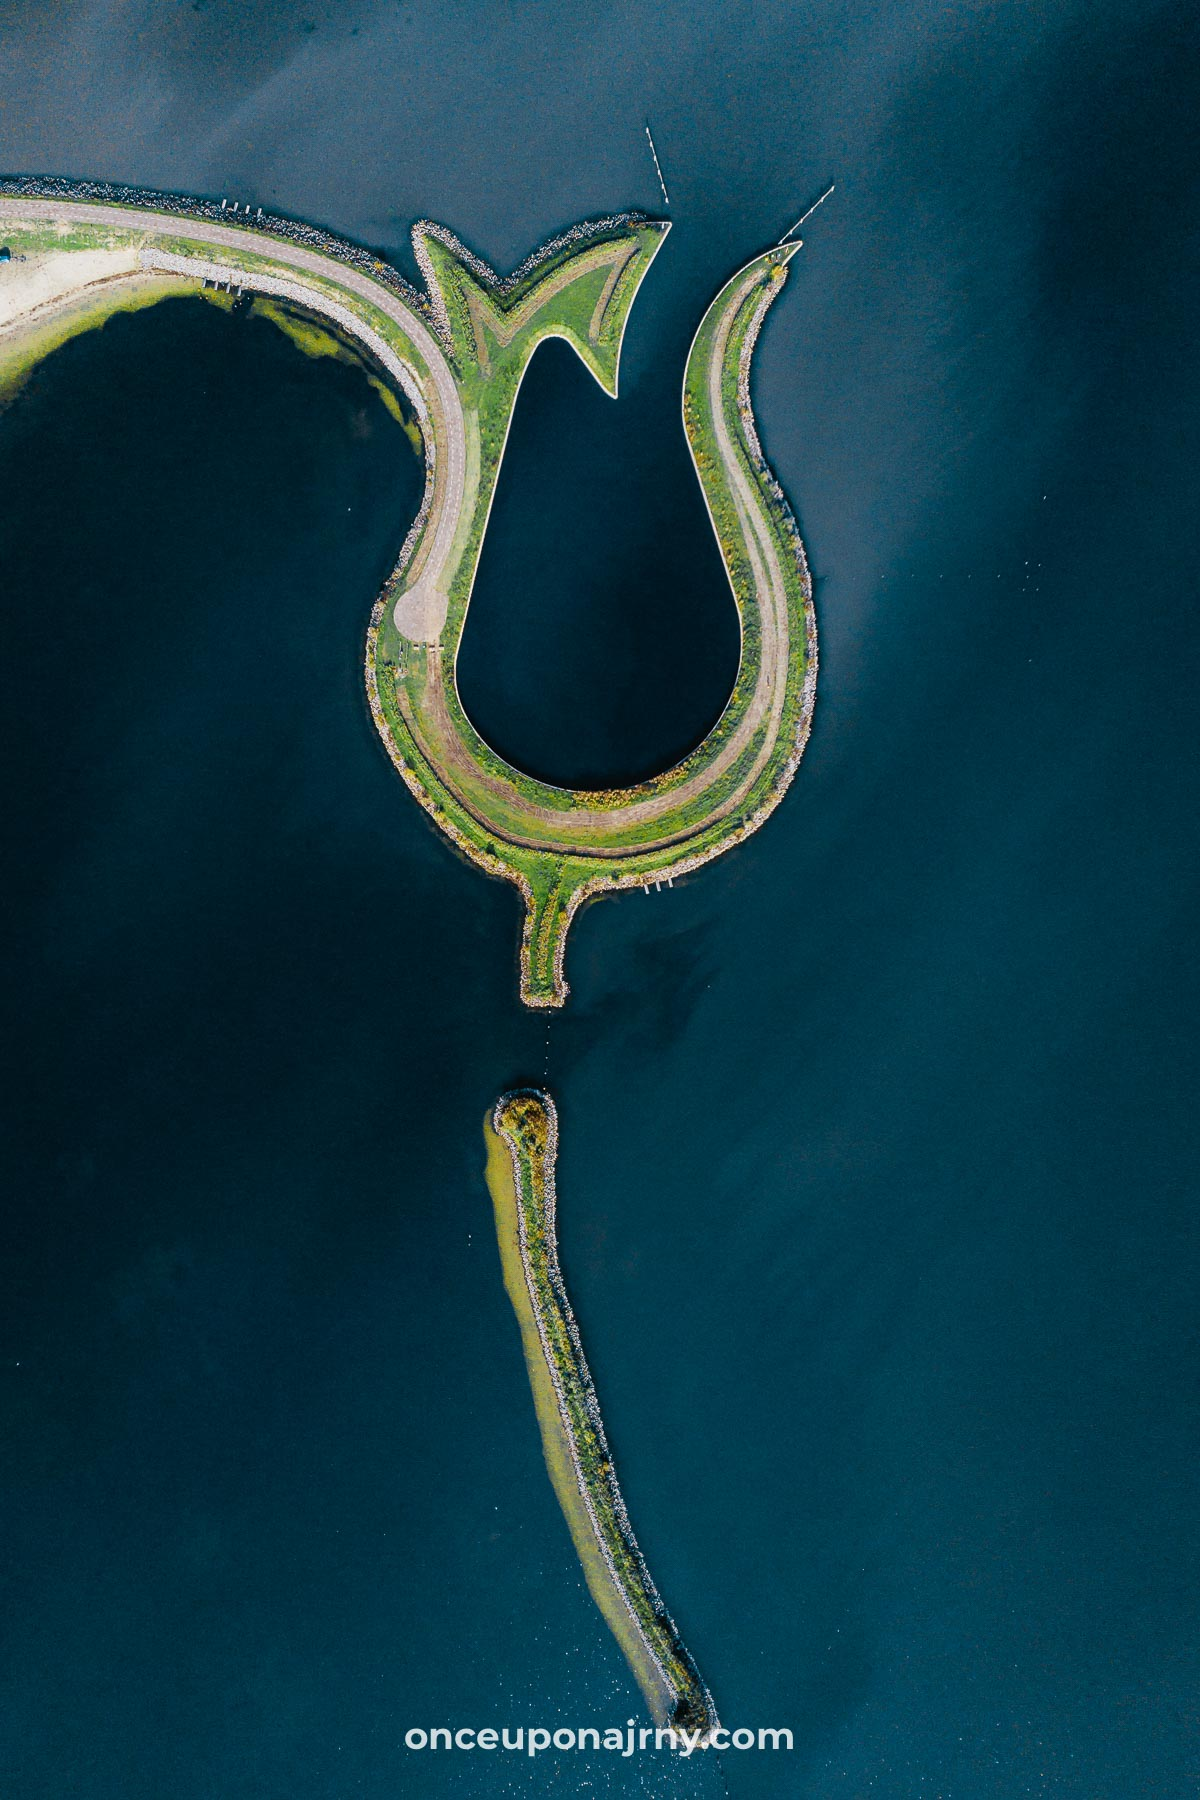 Tulpeiland Flevoland Zeewolde